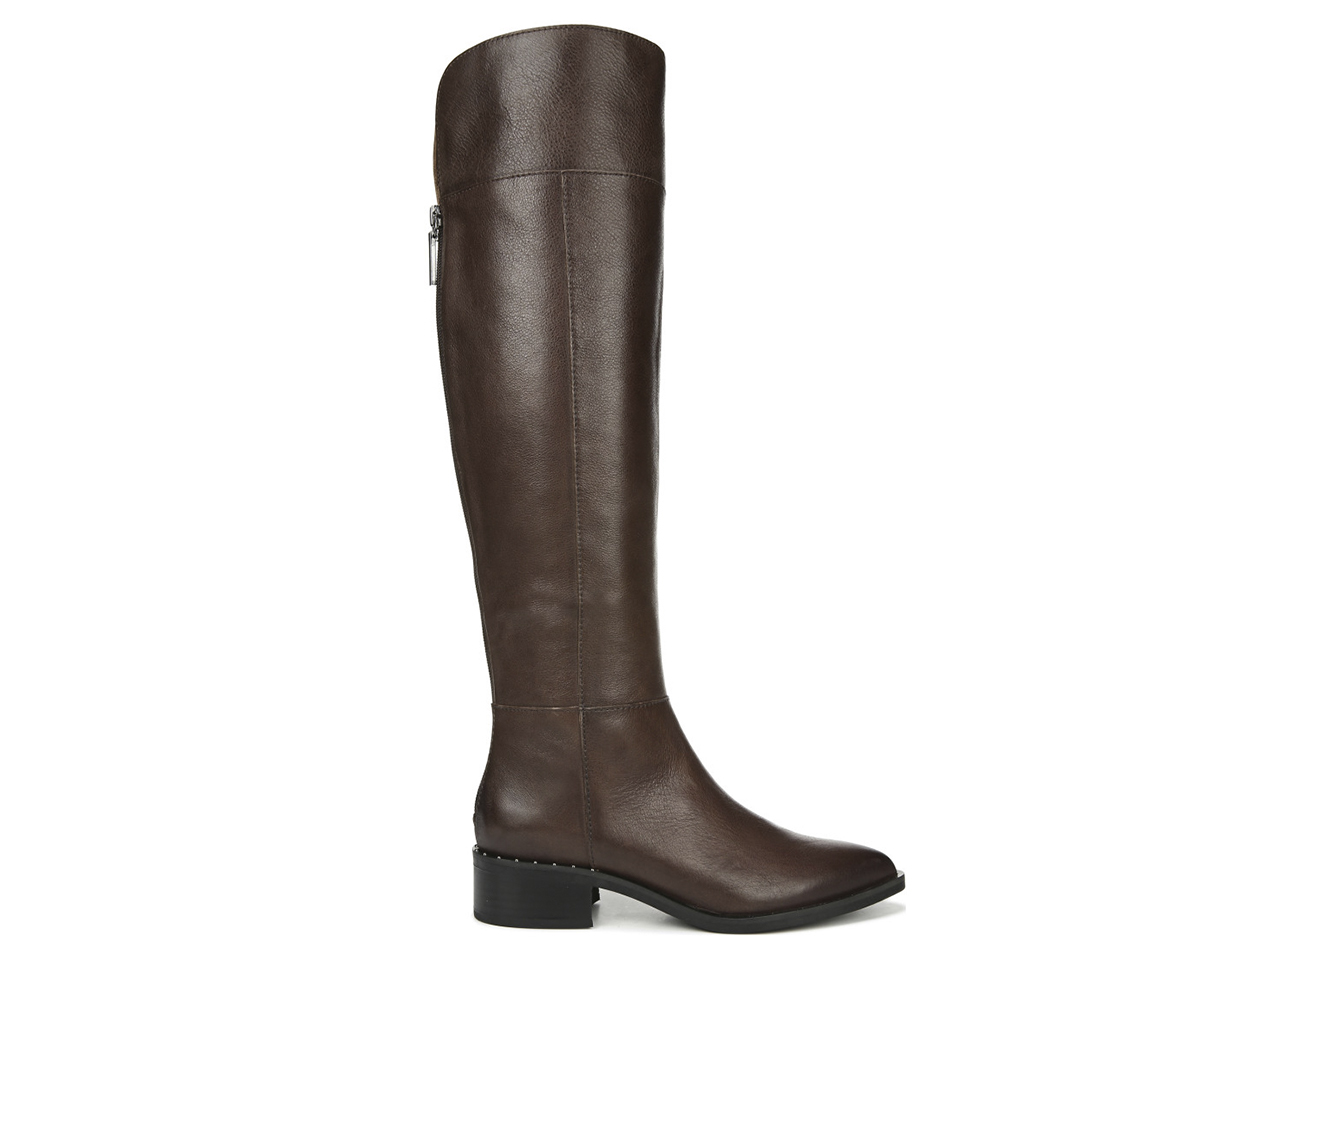 Franco Sarto Daya Women's Boots (Brown - Leather)